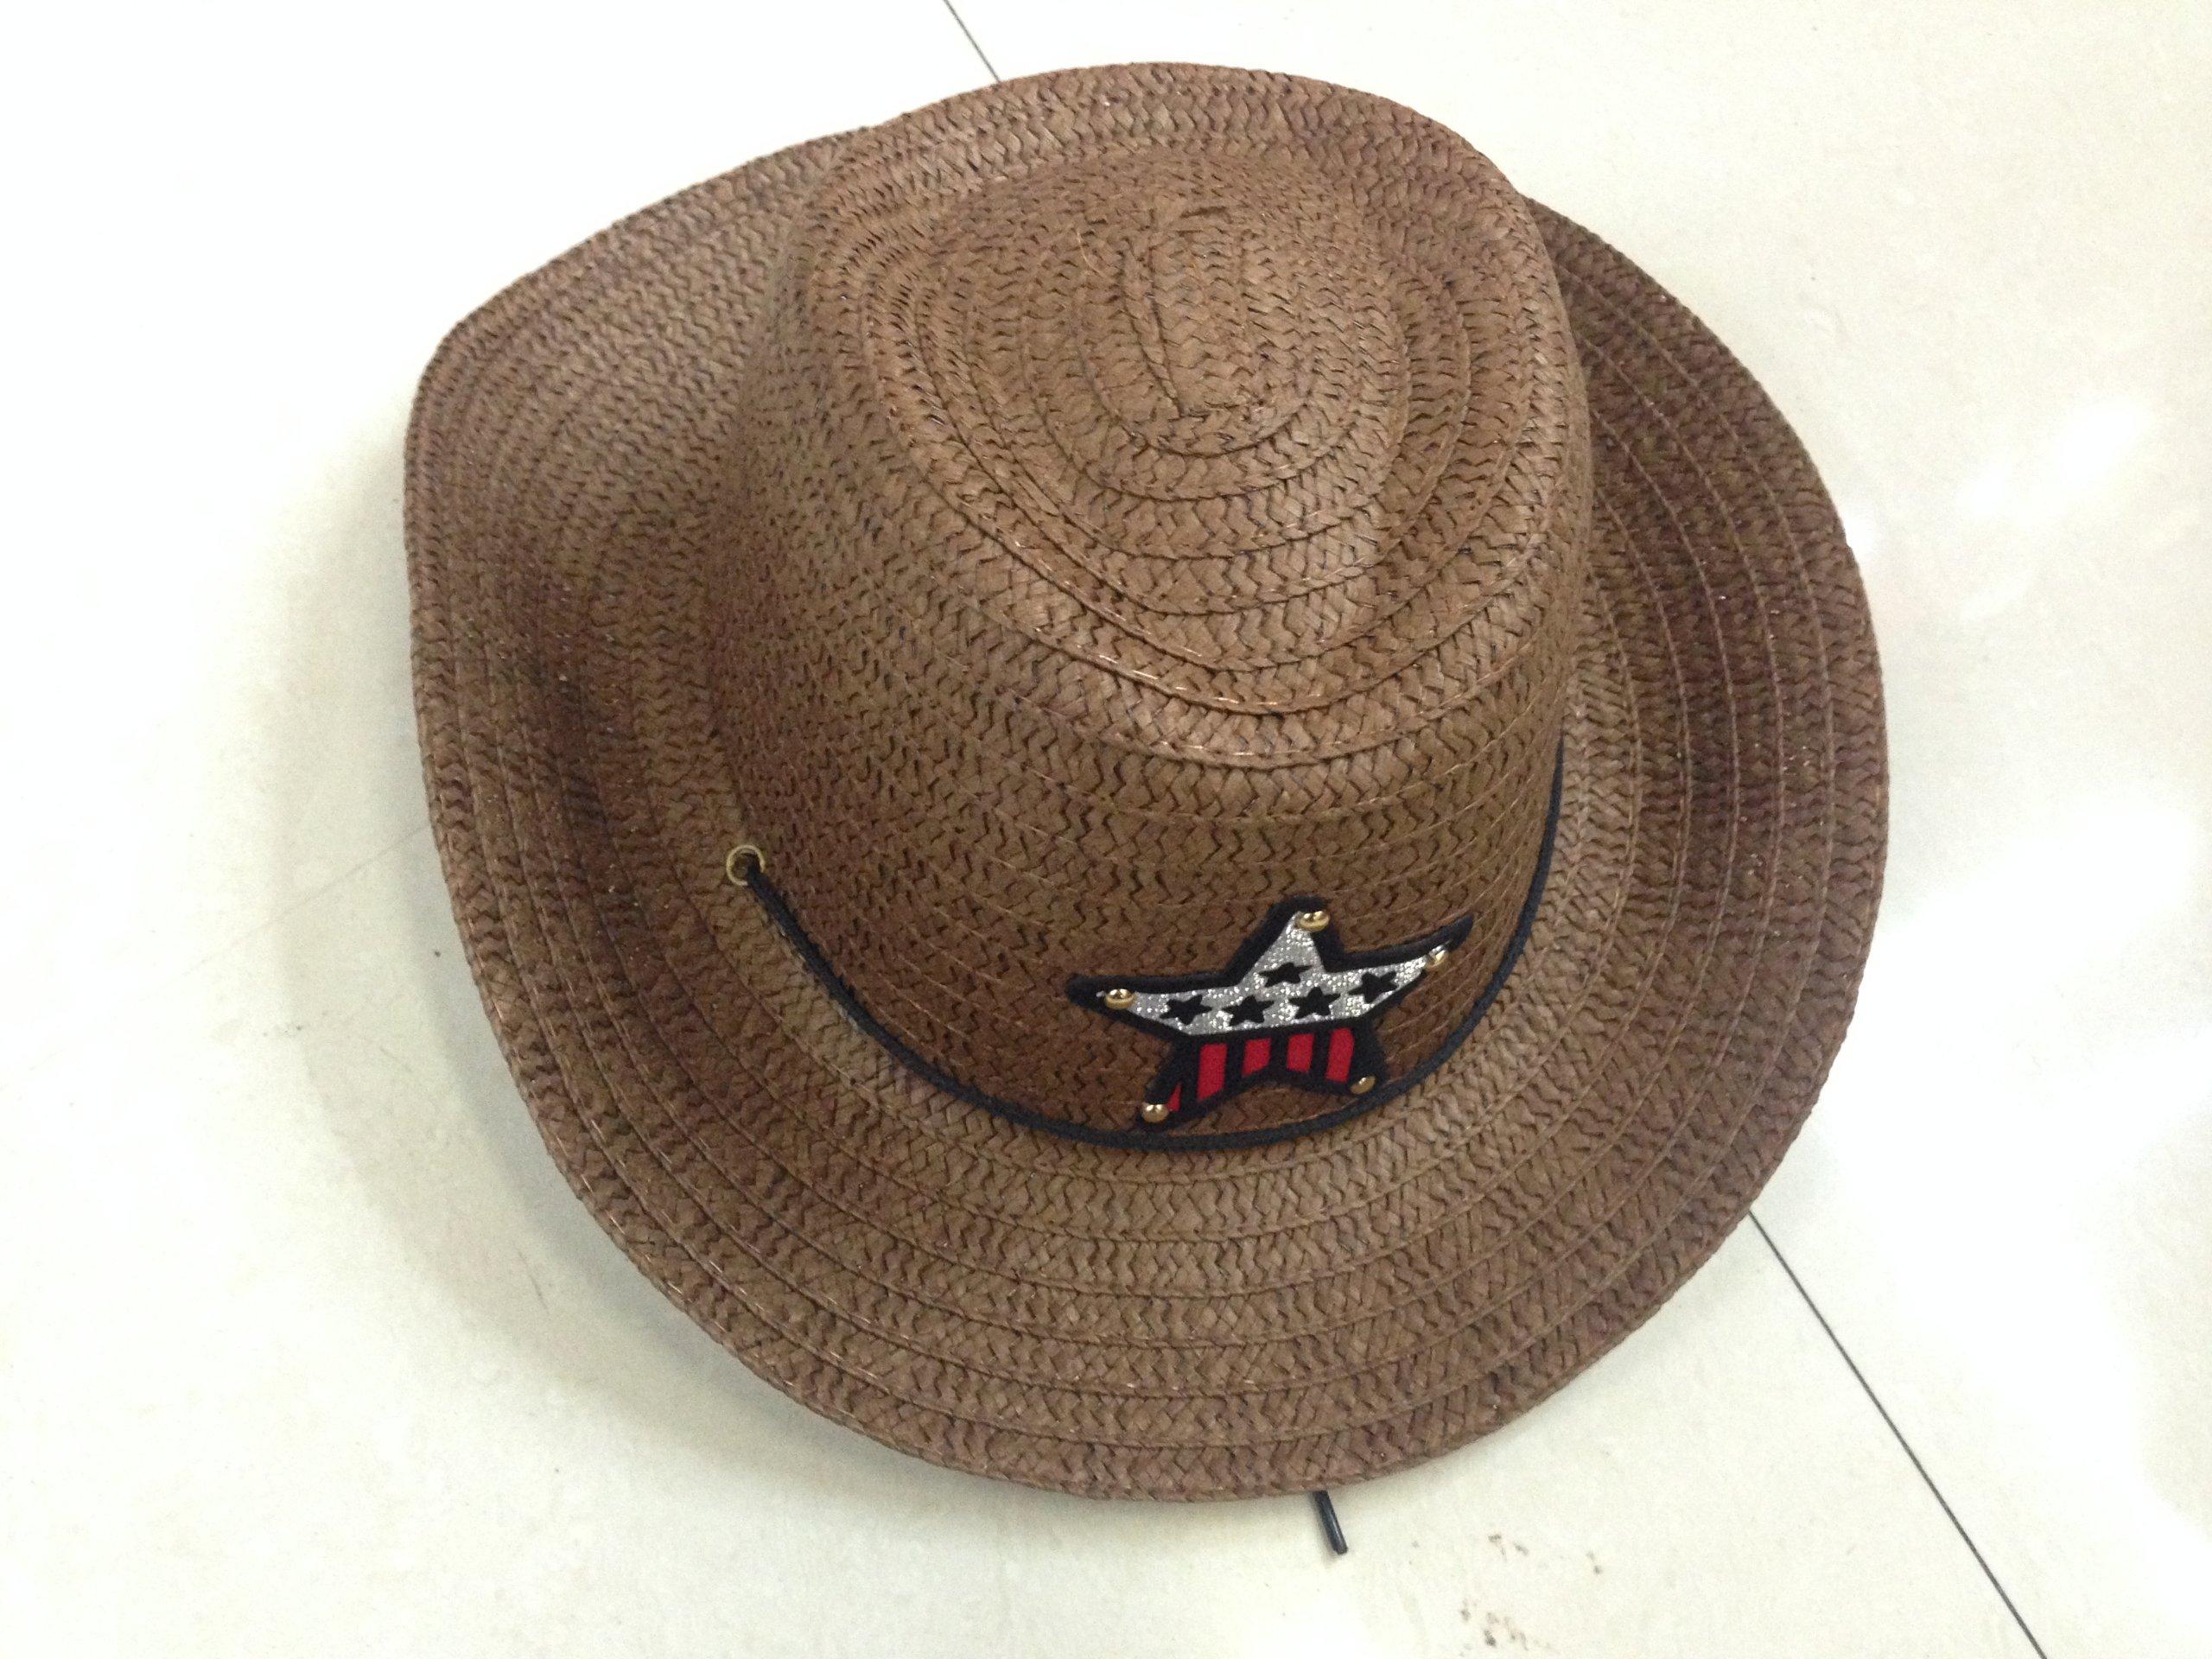 JTC Kids Straw Cowboy Boys Sun Hat Caps Coffee